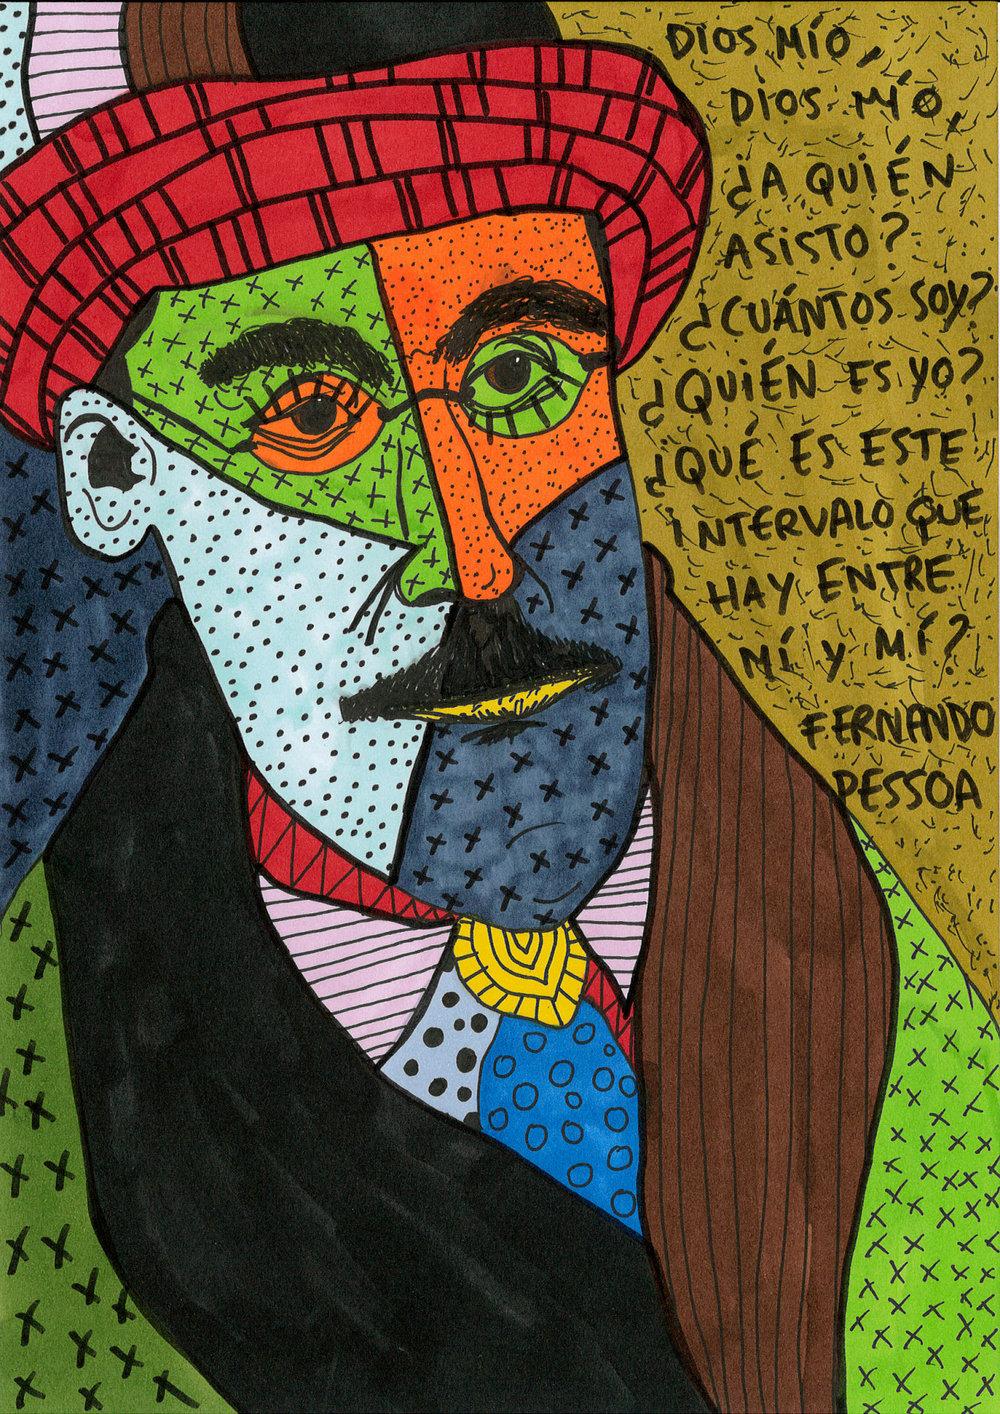 """Fernando Pessoa"" , 2013   Marker and pen on paper, 21 x 29.7 cm"